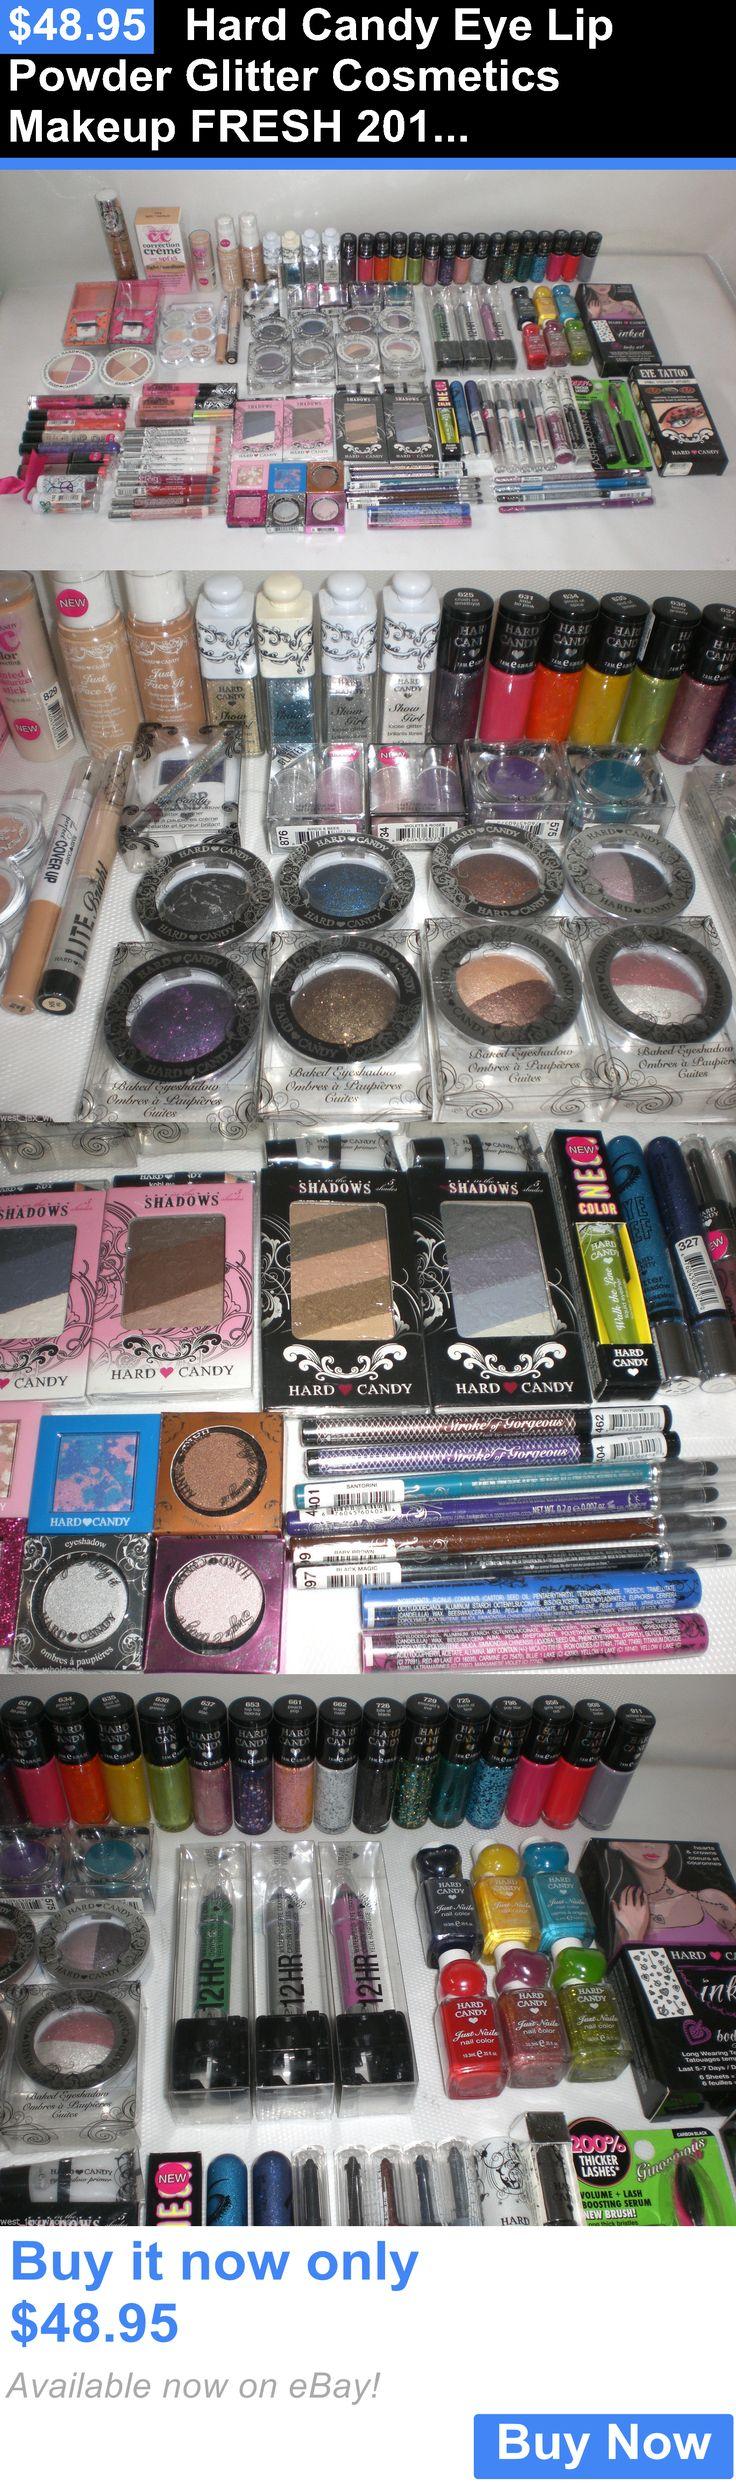 wholesale Makeup: Hard Candy Eye Lip Powder Glitter Cosmetics Makeup Fresh 2016 Wholesale Lot 50 BUY IT NOW ONLY: $48.95